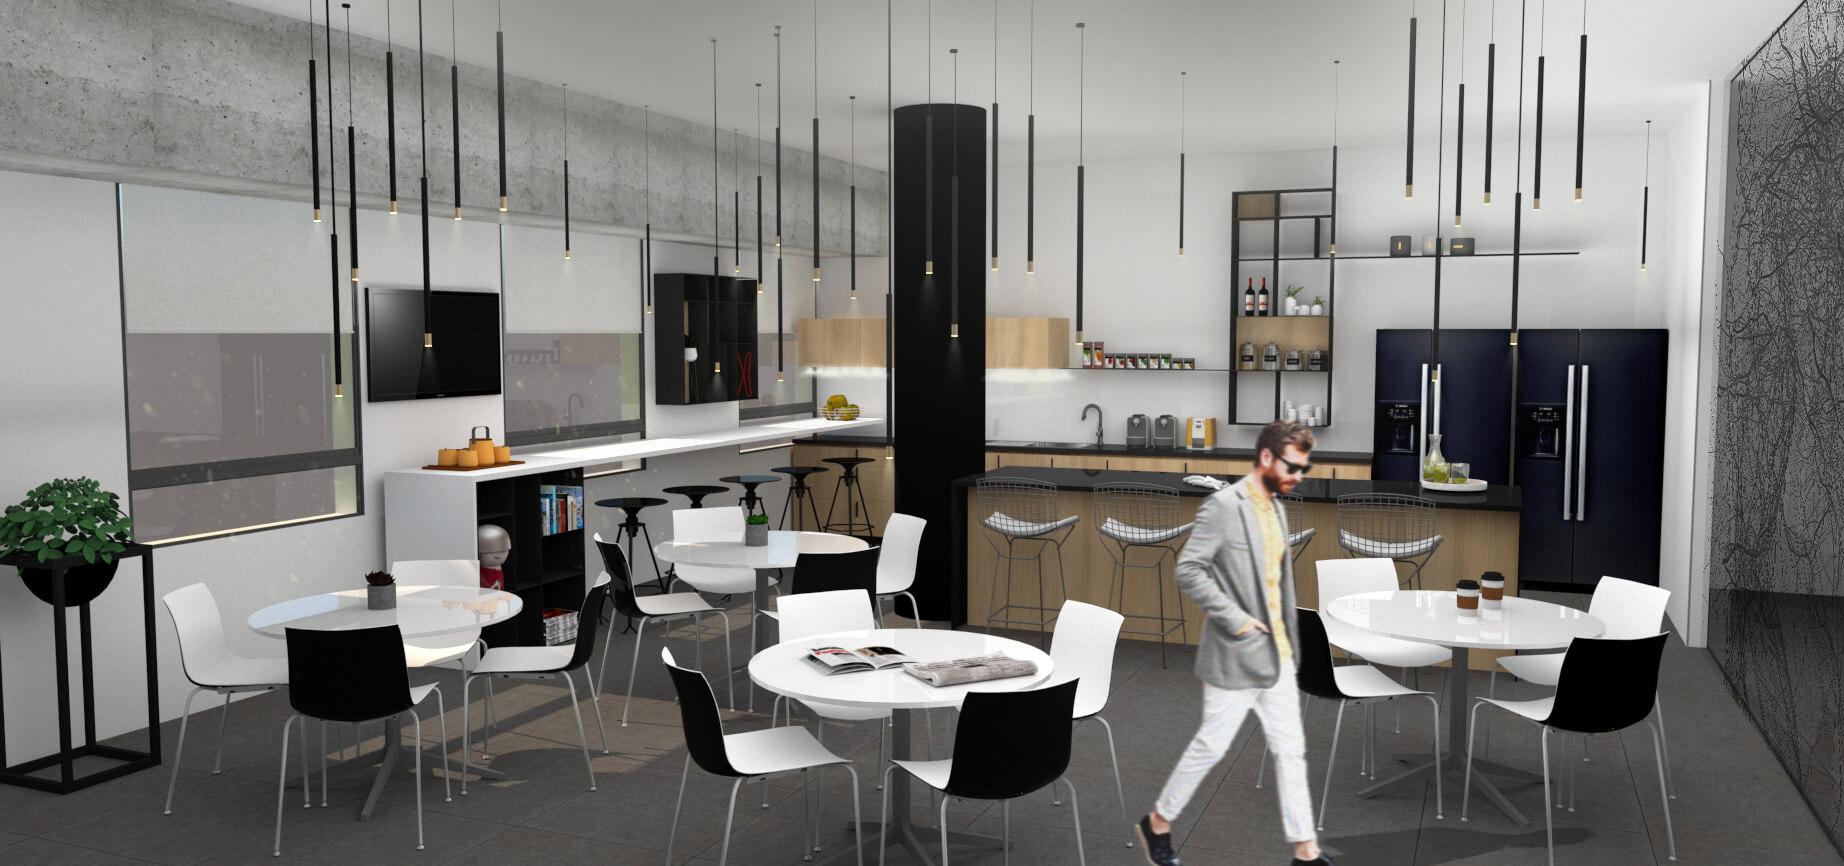 Edwards-main-kitchen